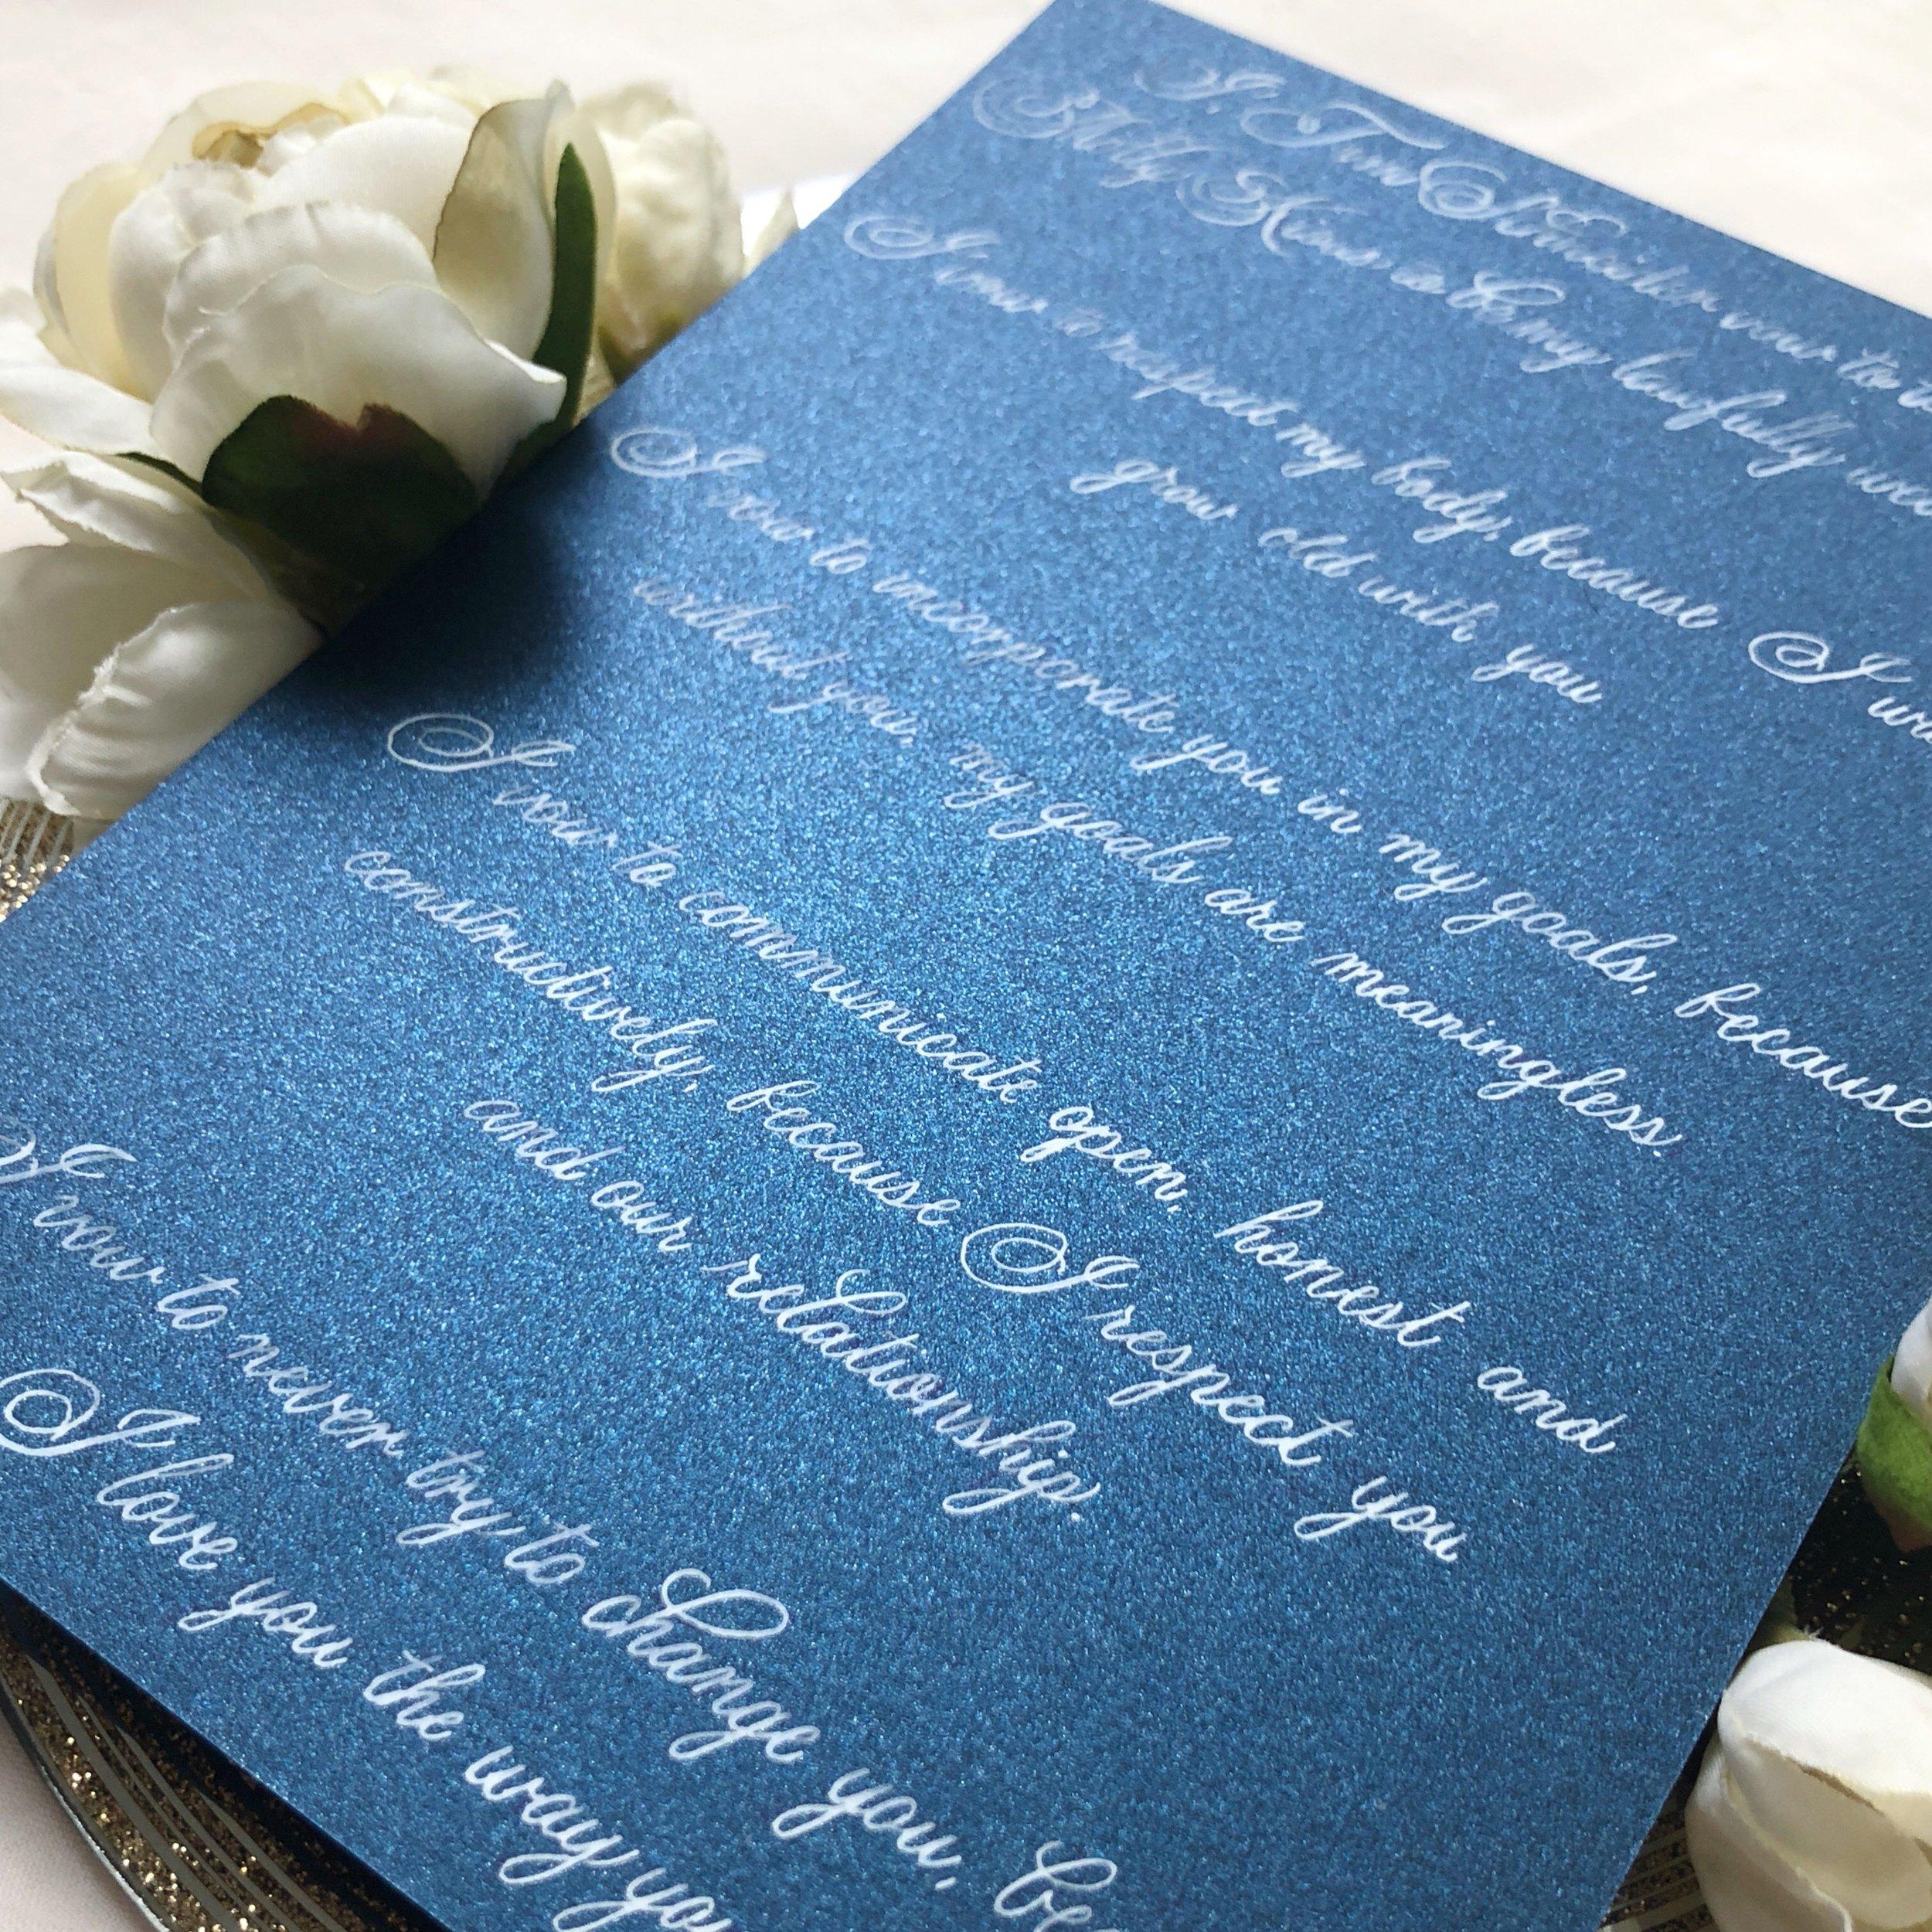 Central PA, York PA, JesSmith Designs, custom, wedding, invitations, bridal, Harrisburg, hanover, calligraphy, baltimore, wedding invitations, lancaster, gettysburg, 07-25 10.19.22.jpg